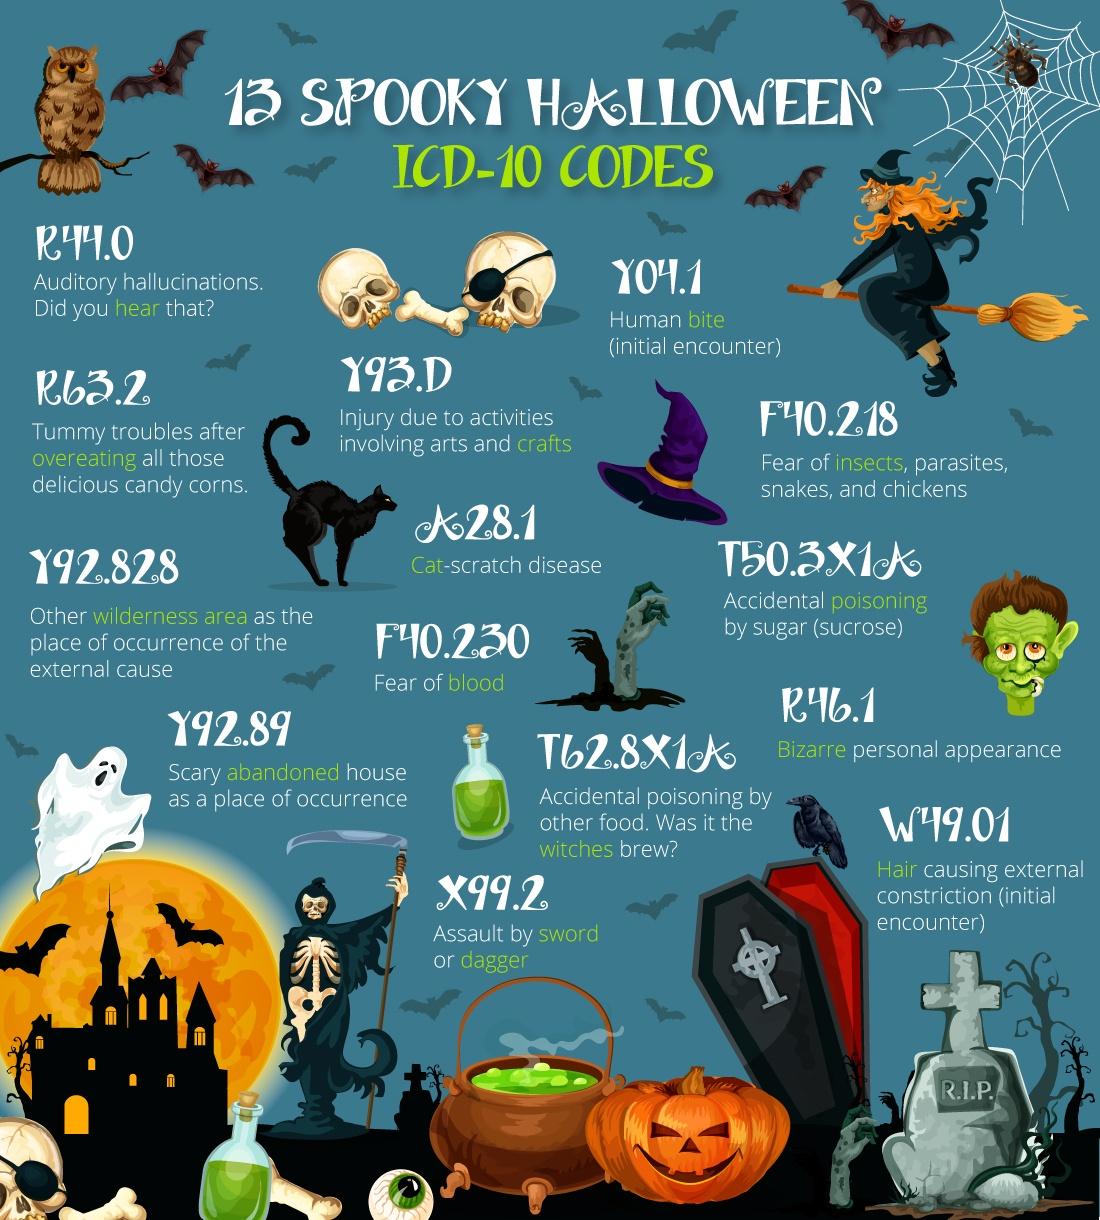 13_spooky_ICD_10_codes-2.jpg